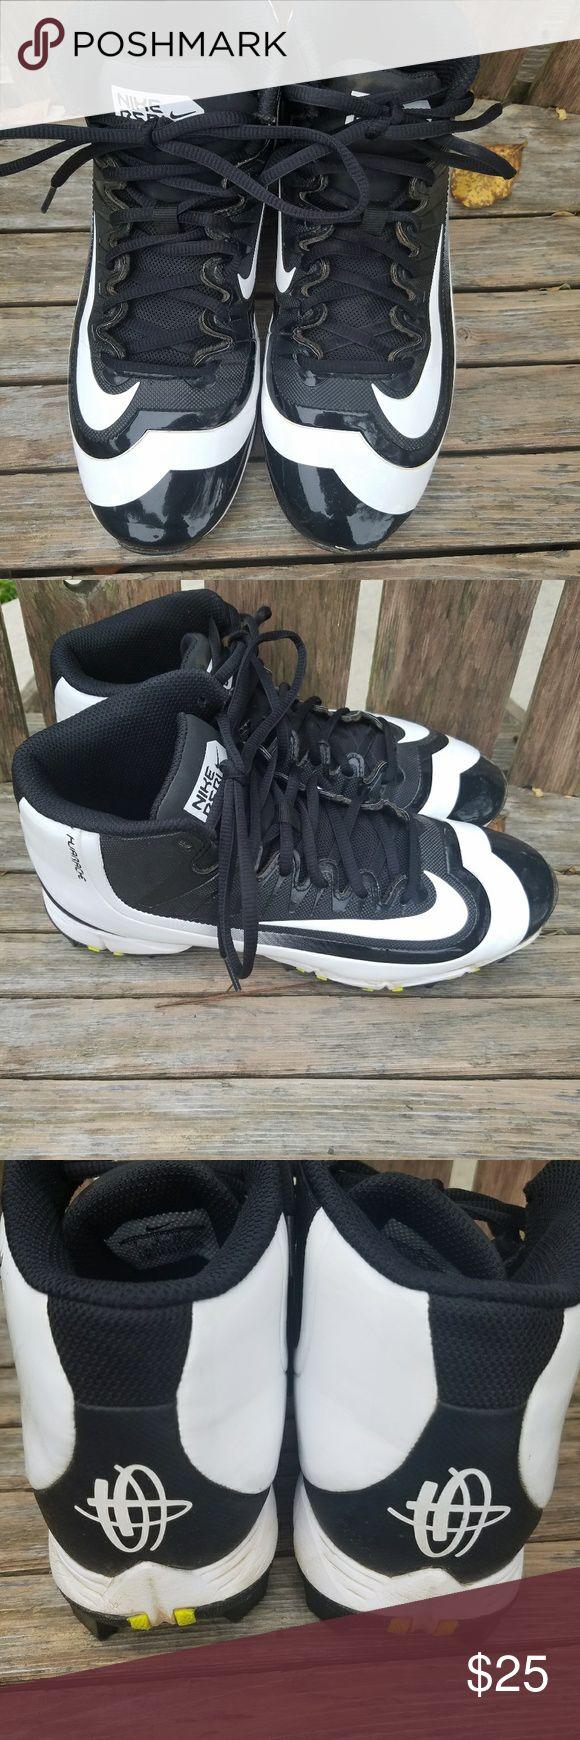 Nike Huarache baseball cleats Men's size 7 High top baseball cleats Nike Shoes Athletic Shoes